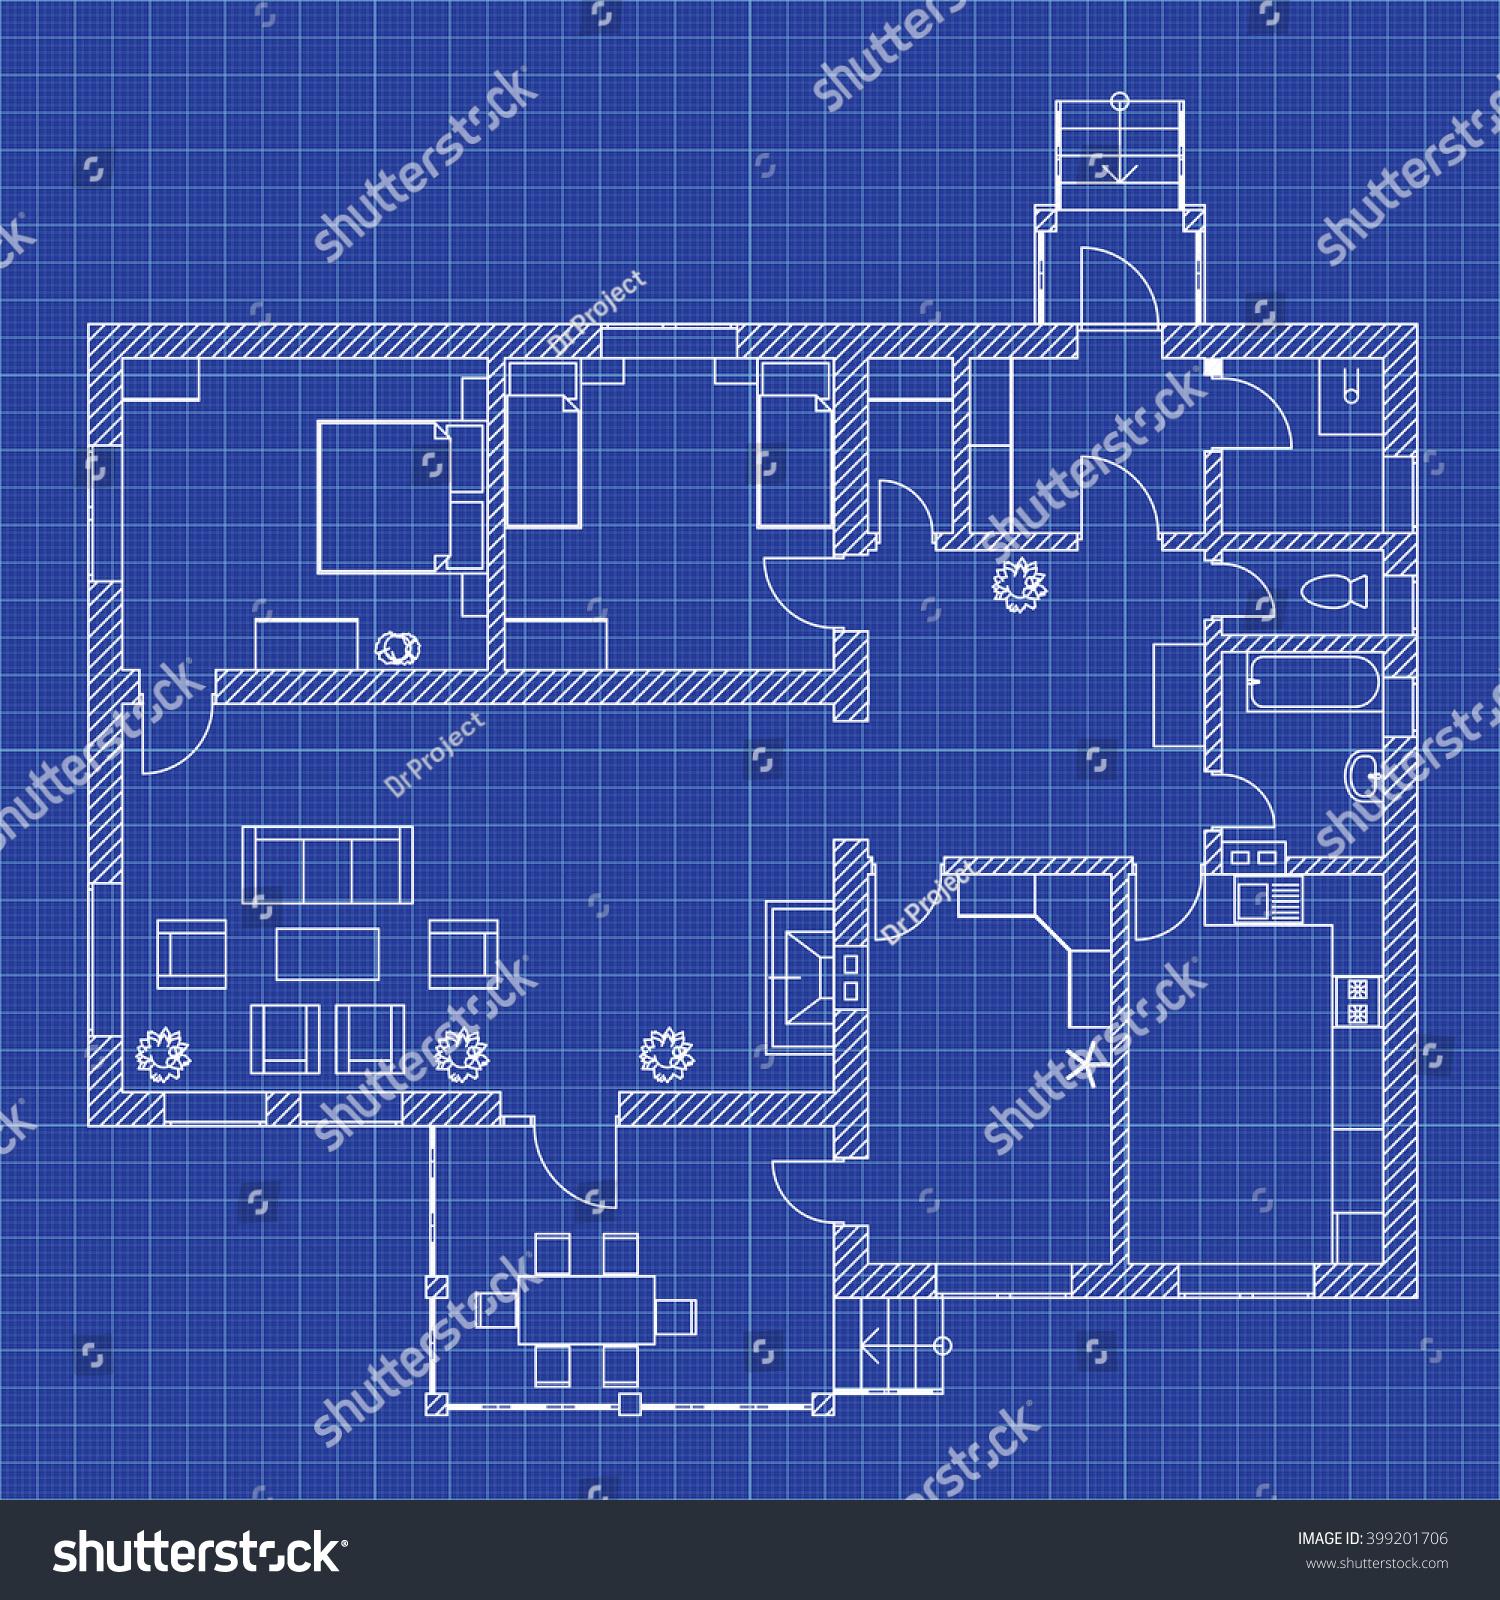 House Design Graph Paper – House Plan 2017